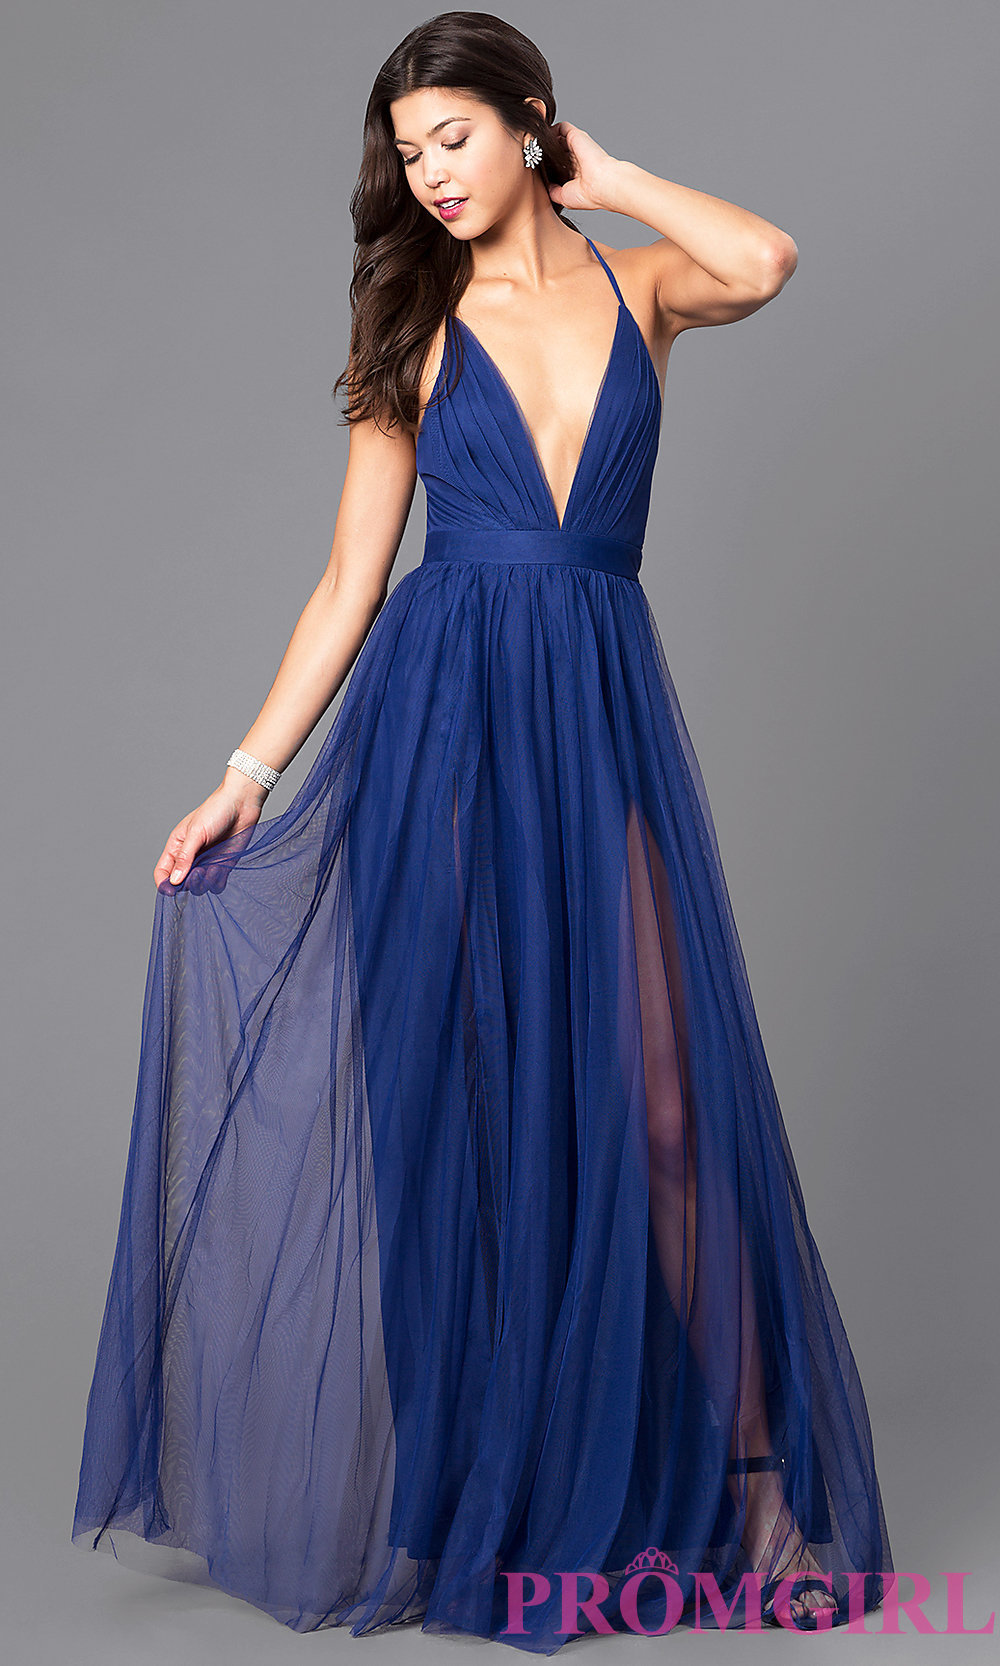 Flowy A-line V-neck Burgundy Tulle Ball Dress with Side Slit ...